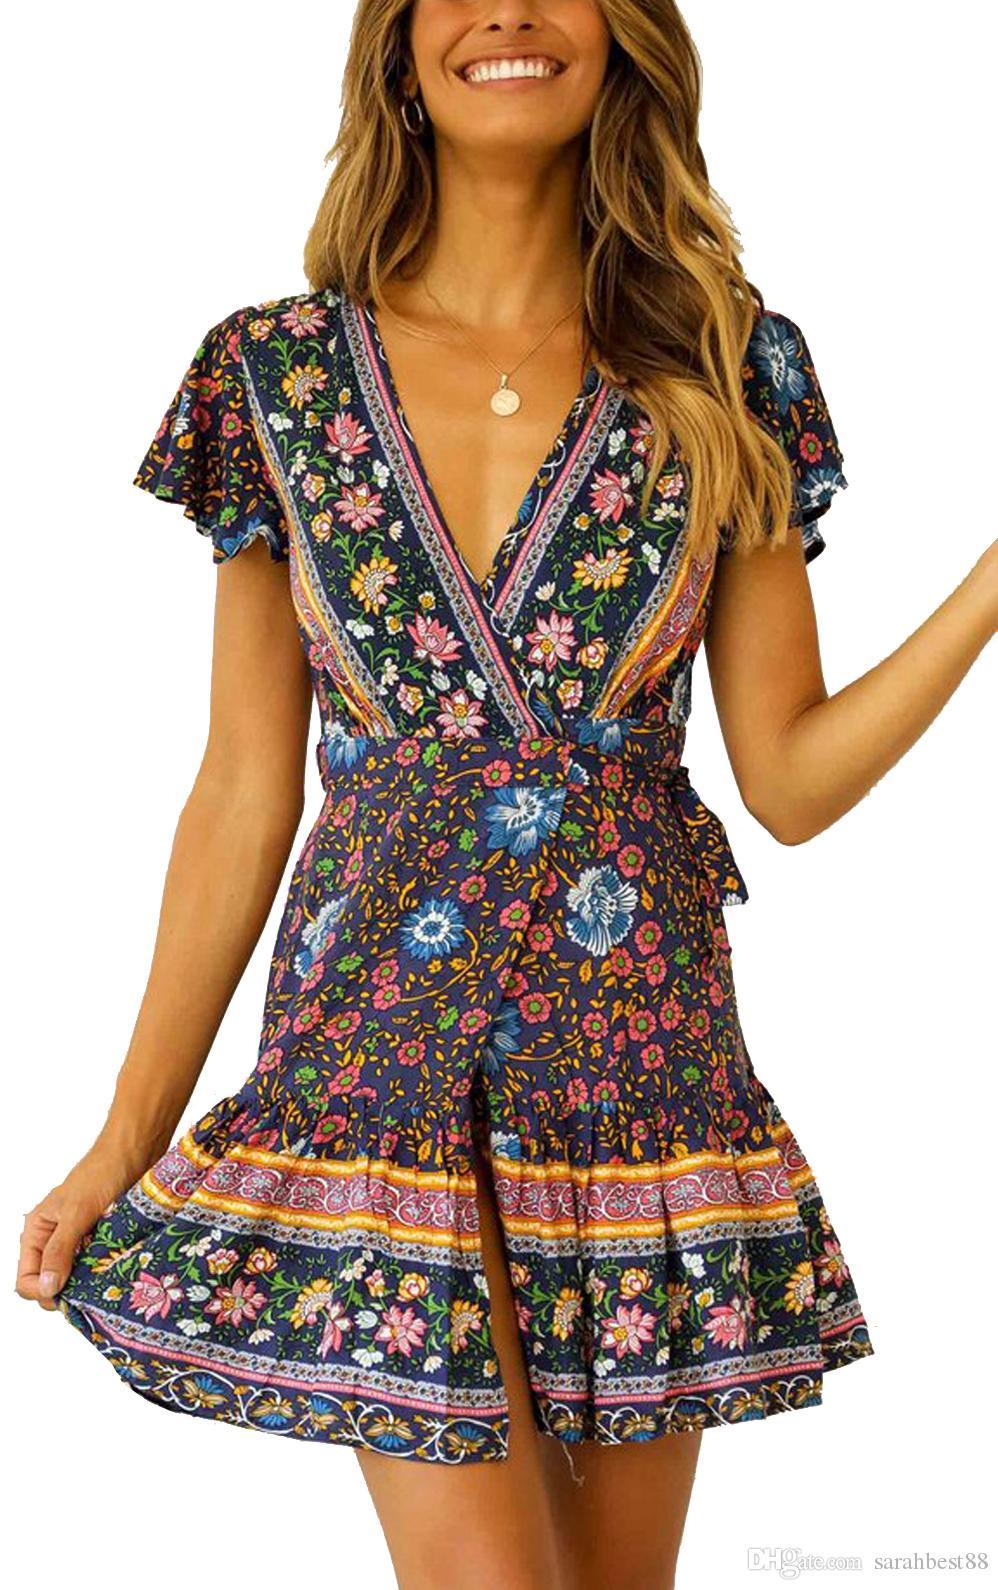 Women Short Dress Short Sleeve V-Neck Lacing Wrapped Front Split Floral Printed Swing Party Beach Dress Summer Beachwear